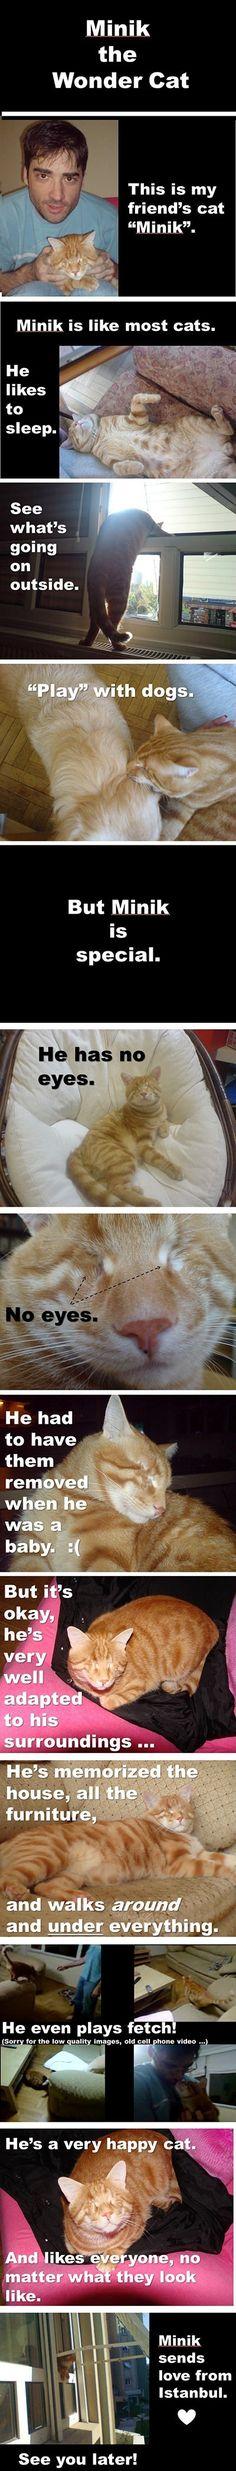 Minik the Wonder Cat.